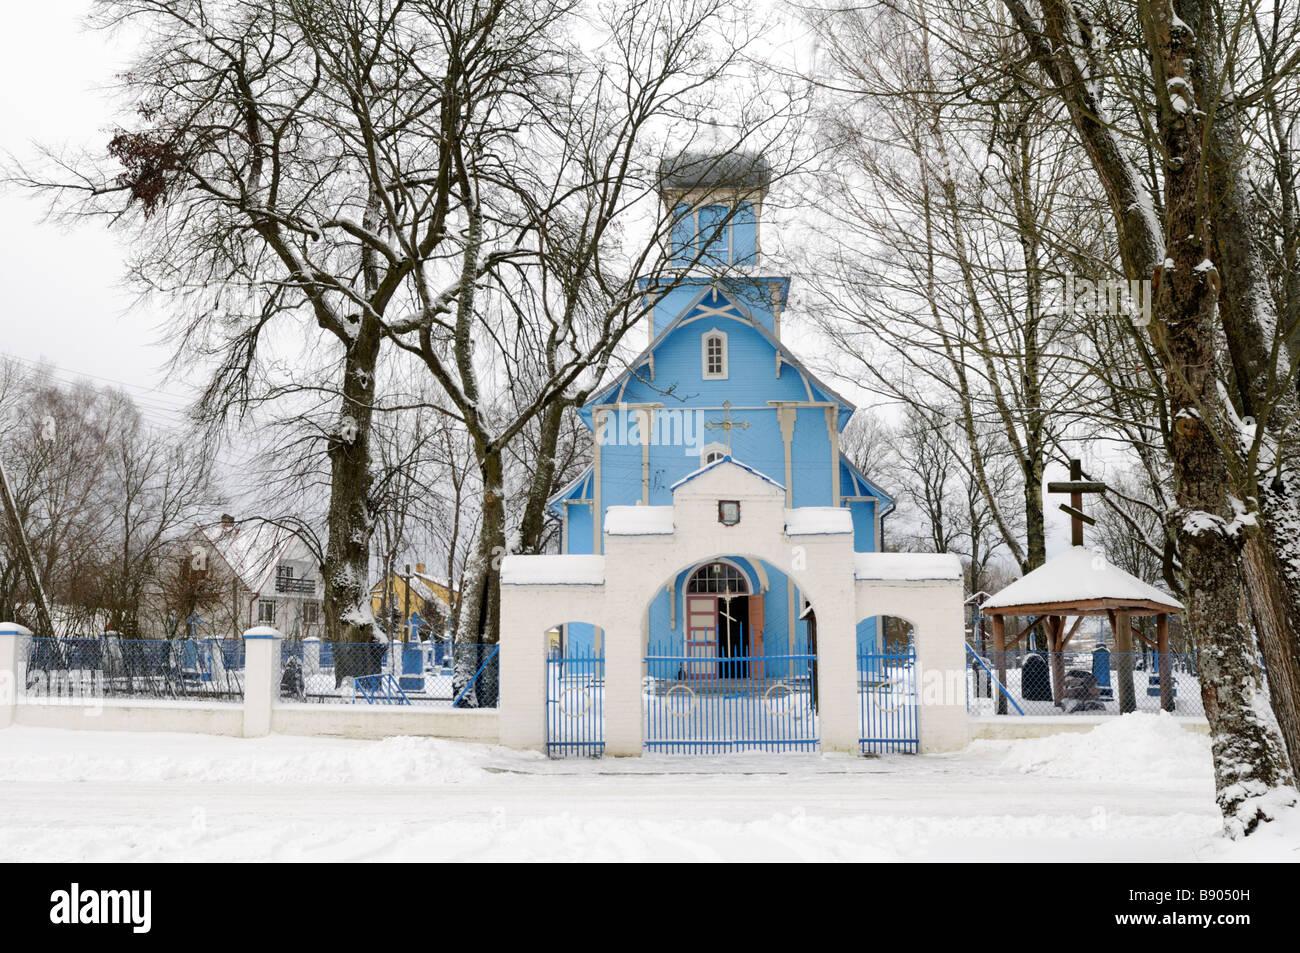 Orthodox church (b. 1946), Dubicze Cerkiewne, Poland - Stock Image